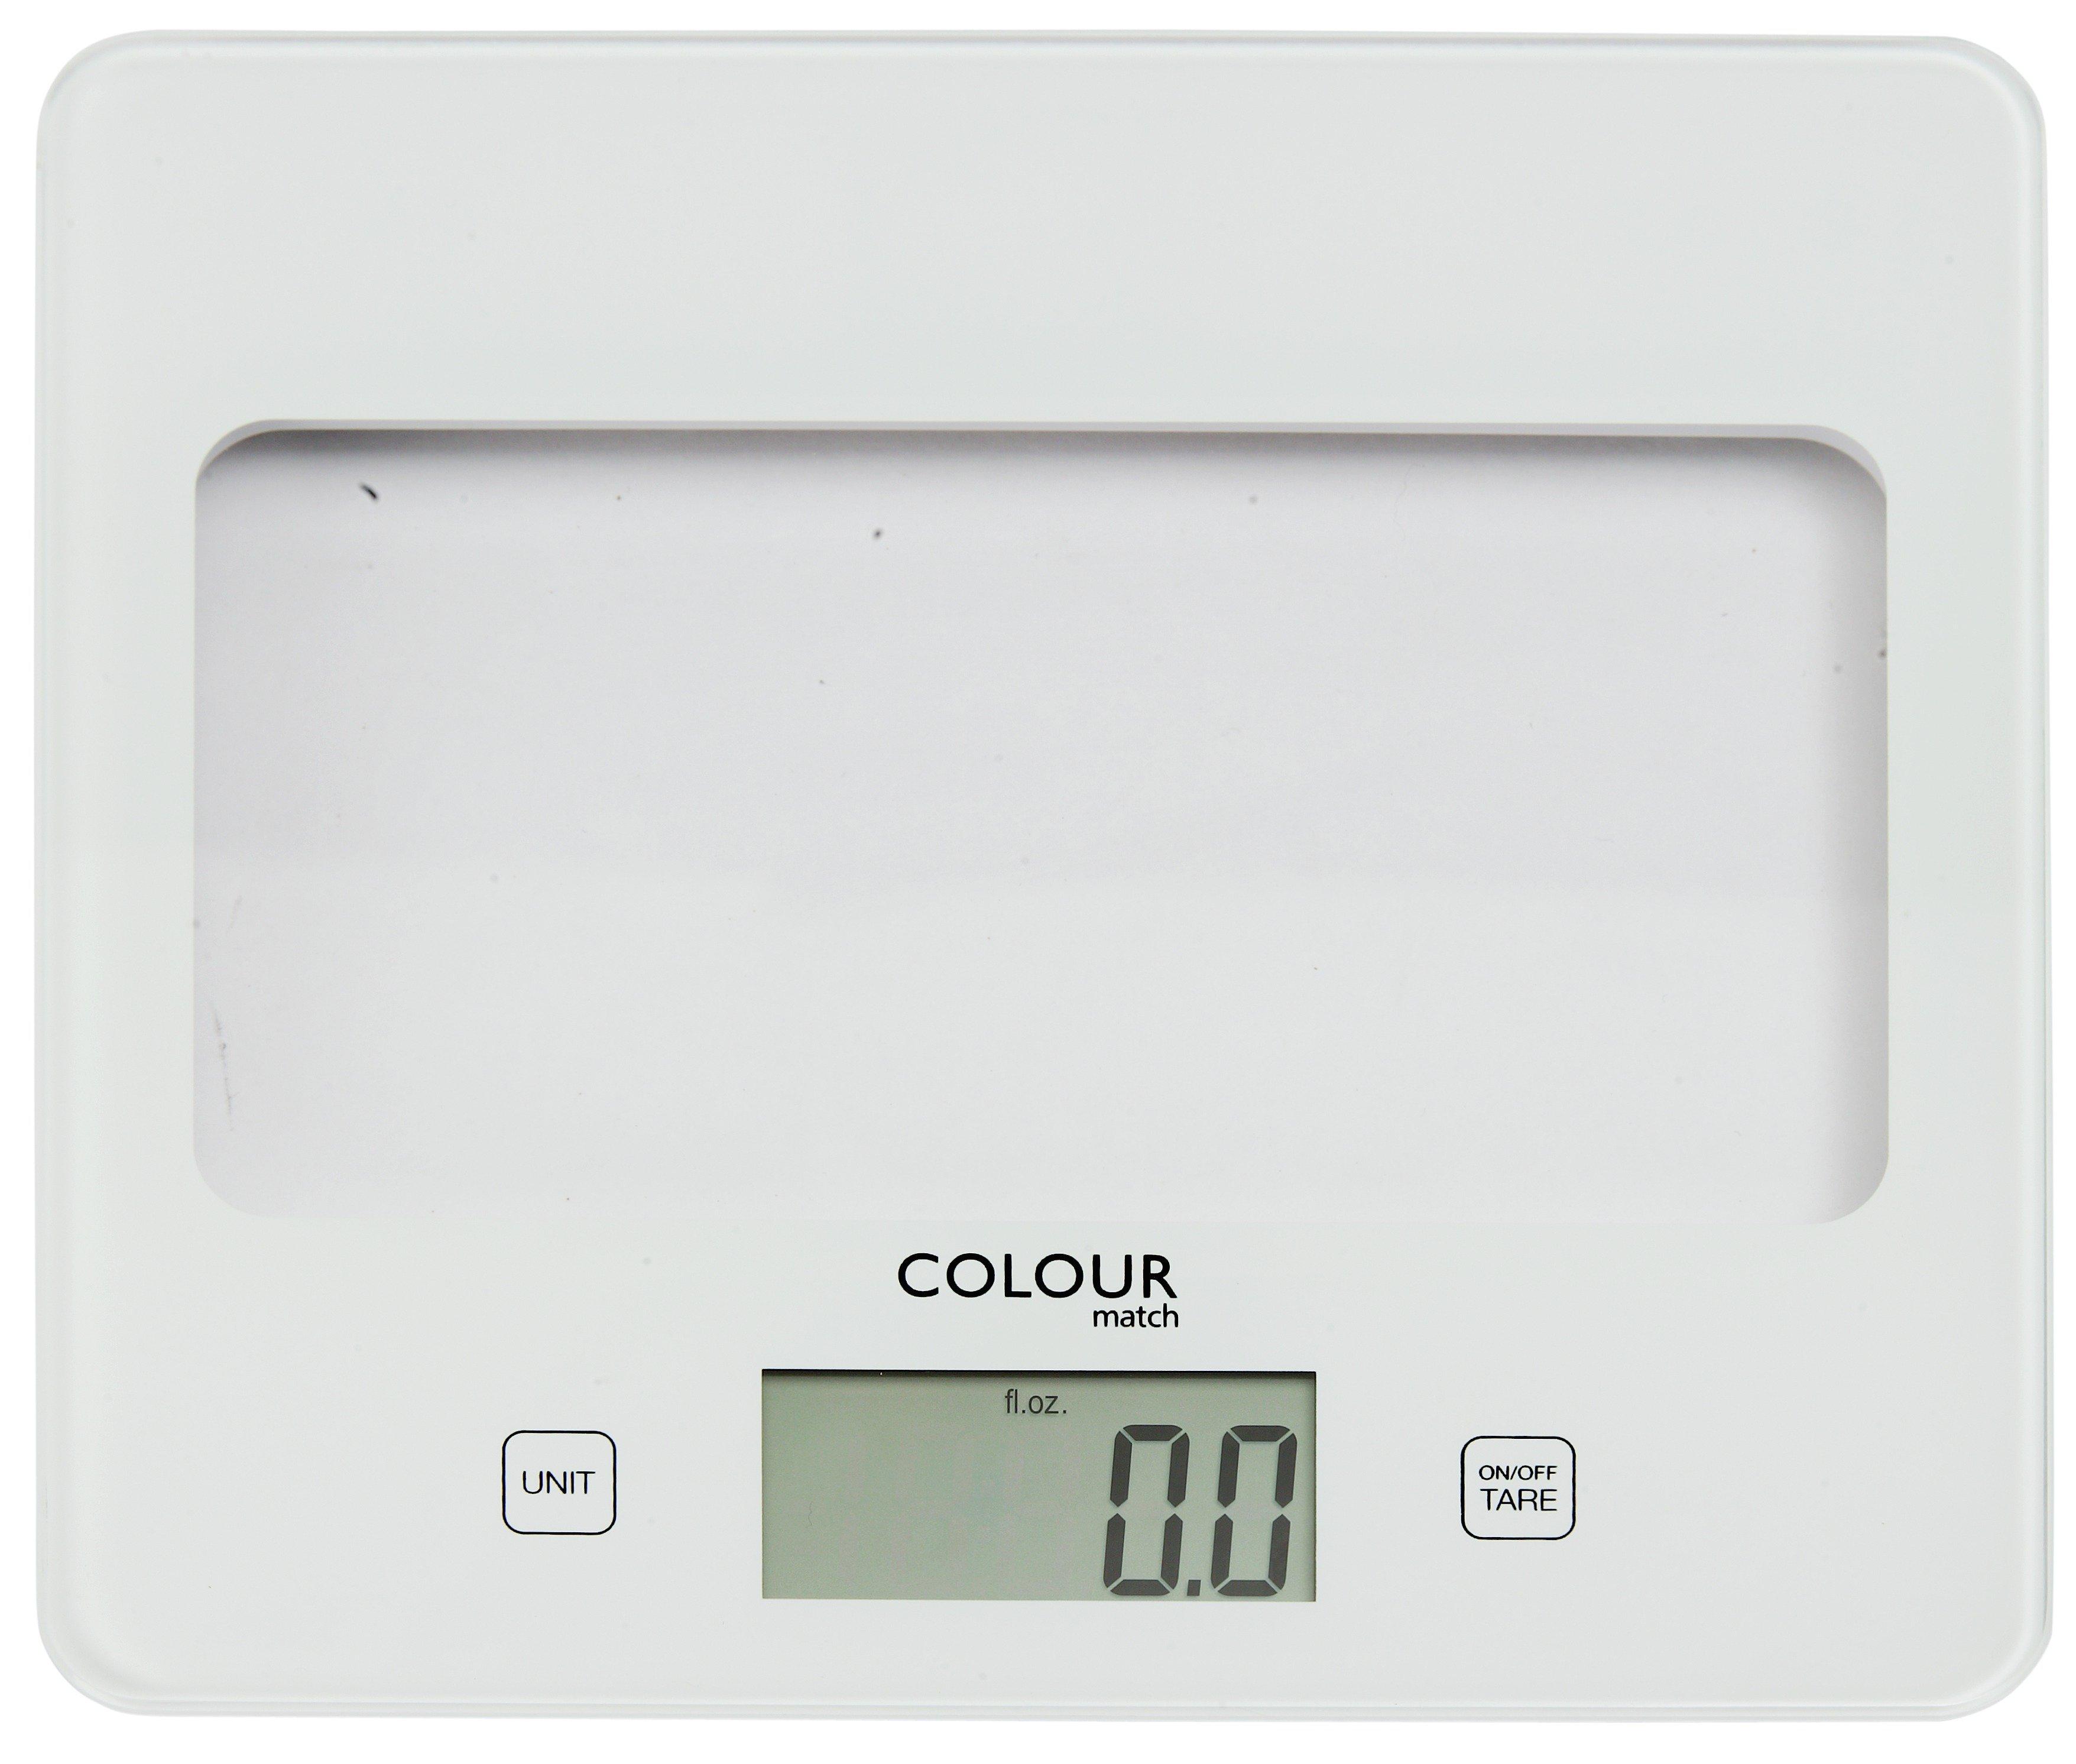 colour-match-digital-kitchen-scale-super-white